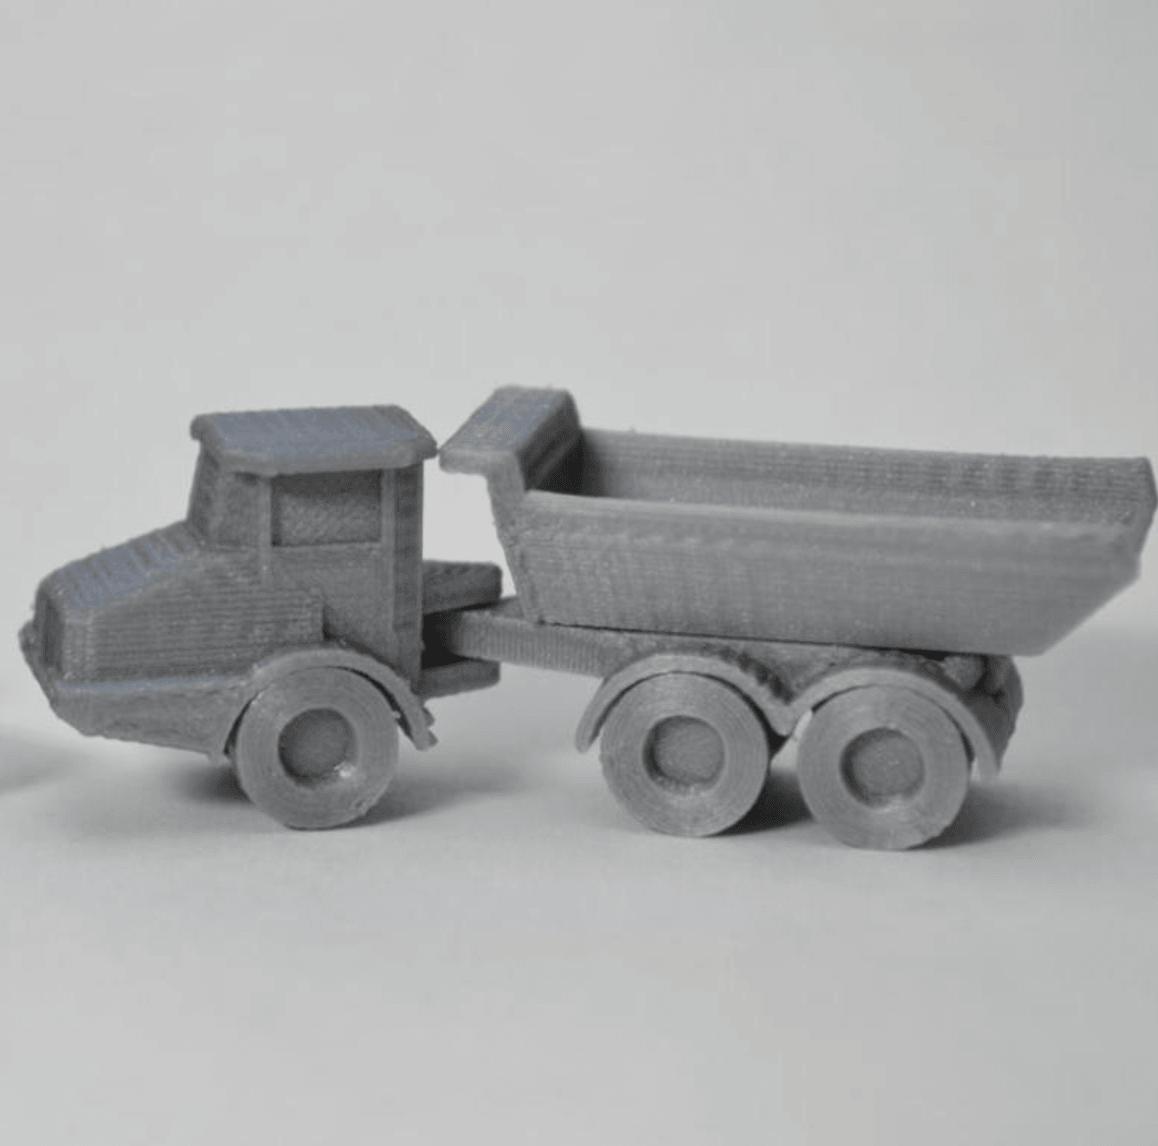 Capture d'écran 2018-03-13 à 17.56.41.png Download free STL file Articulated Dump Truck • Design to 3D print, MakeItWork